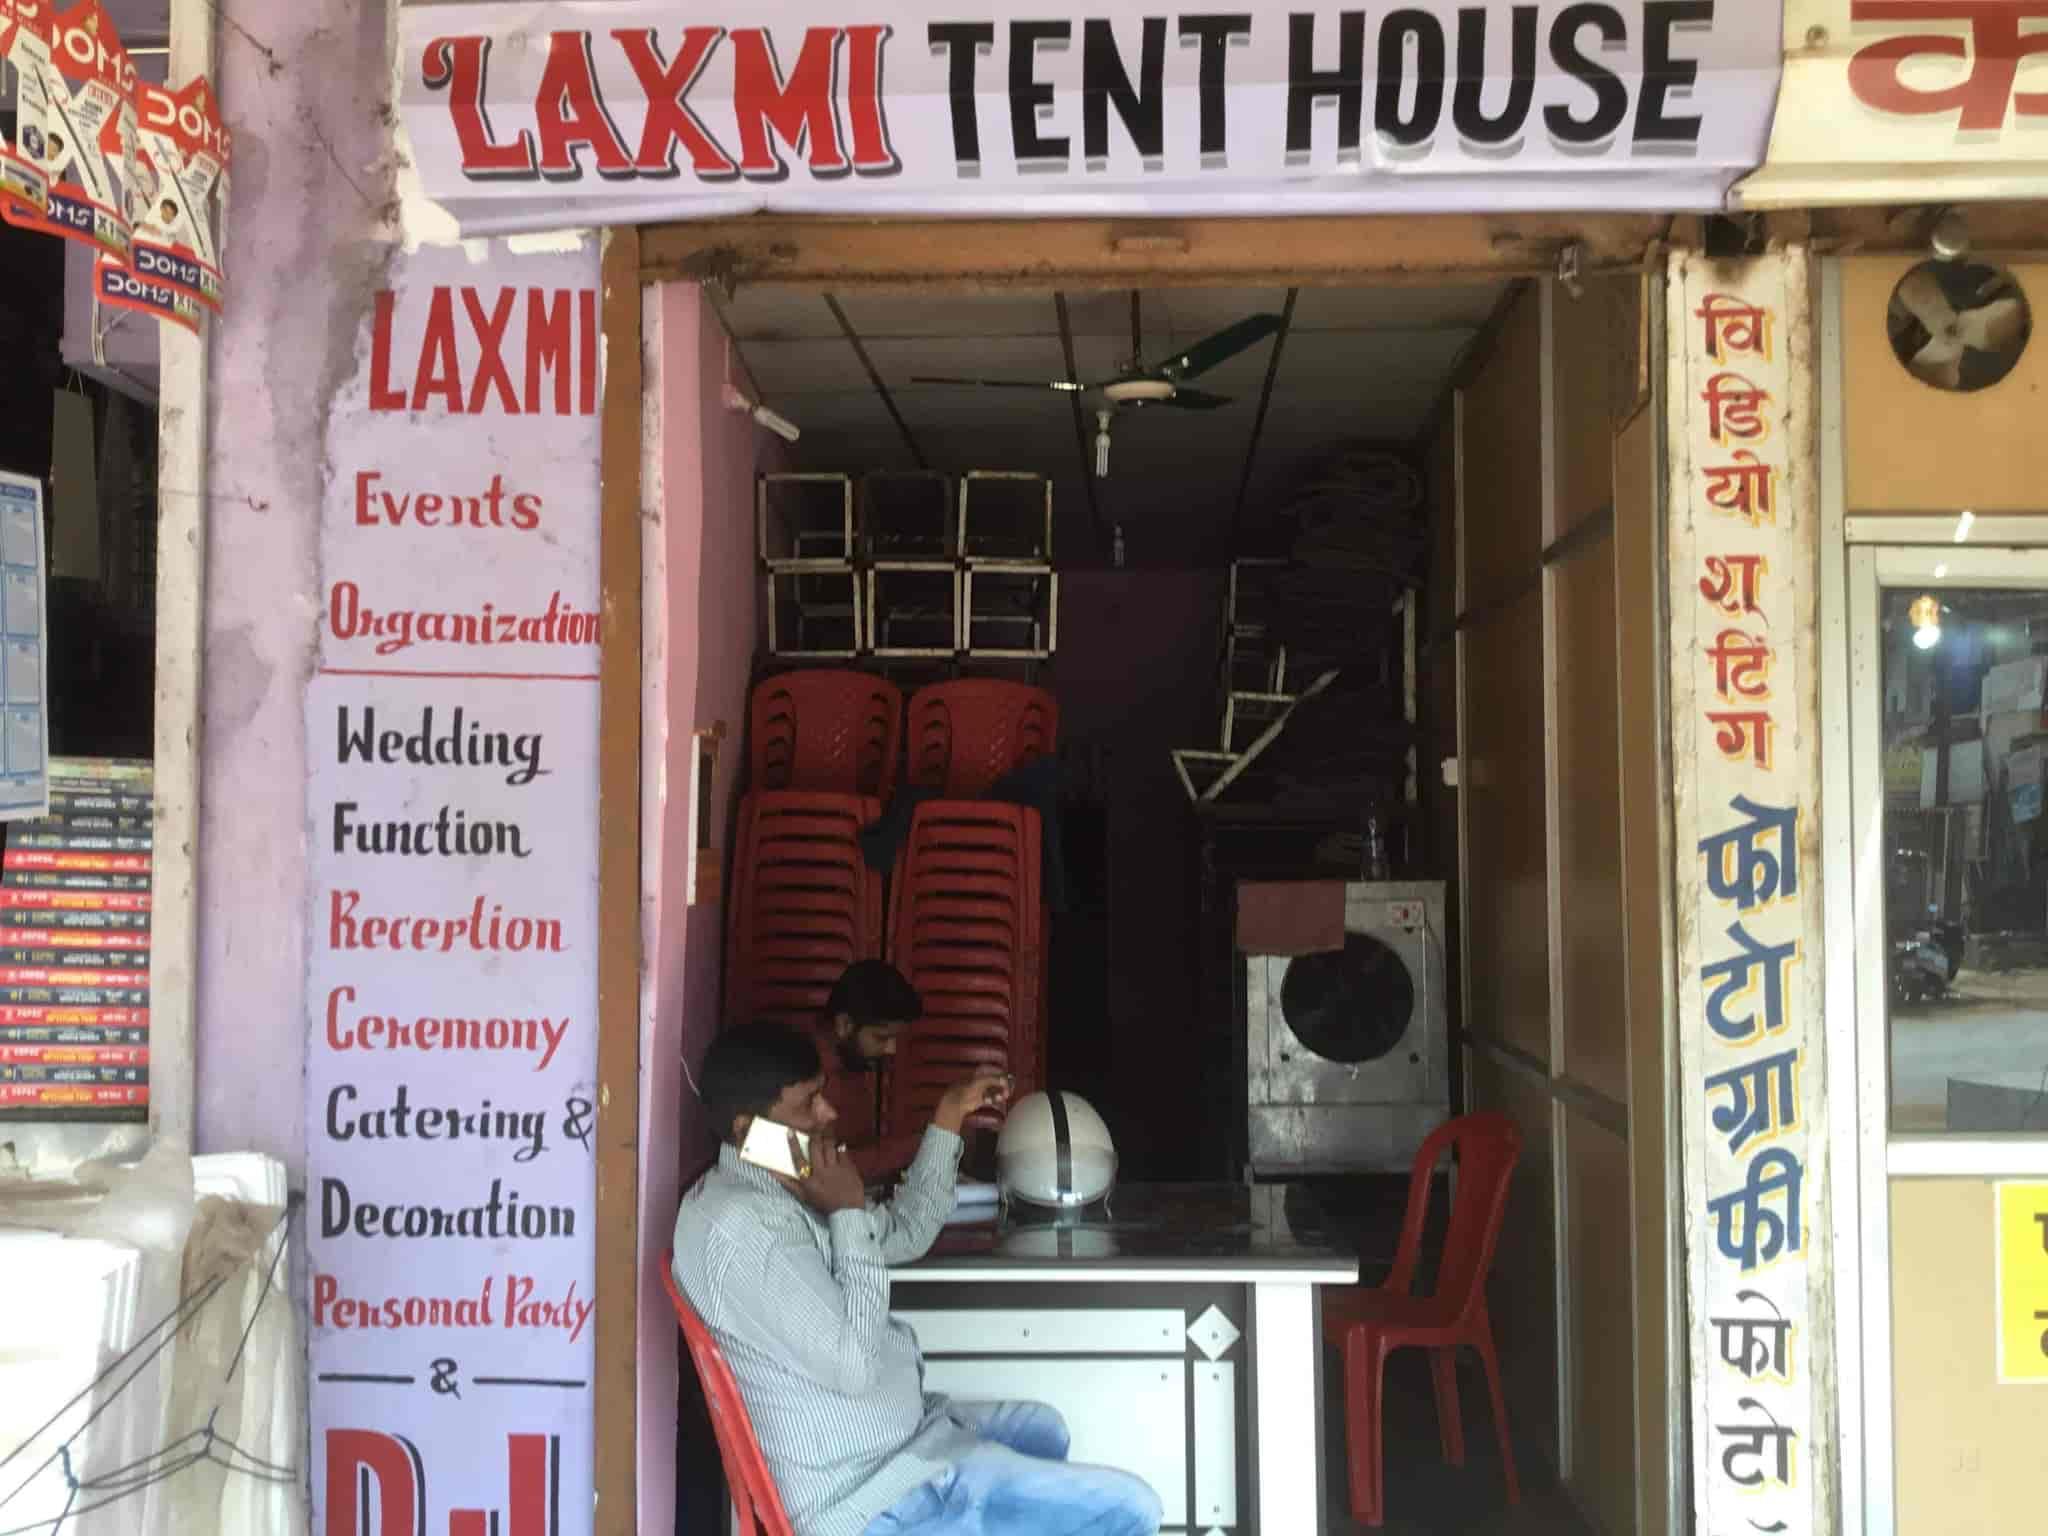 Laxmi Tent u0026 Event Organization Maroda Sector - Caterers in Durg - Justdial & Laxmi Tent u0026 Event Organization Maroda Sector - Caterers in Durg ...